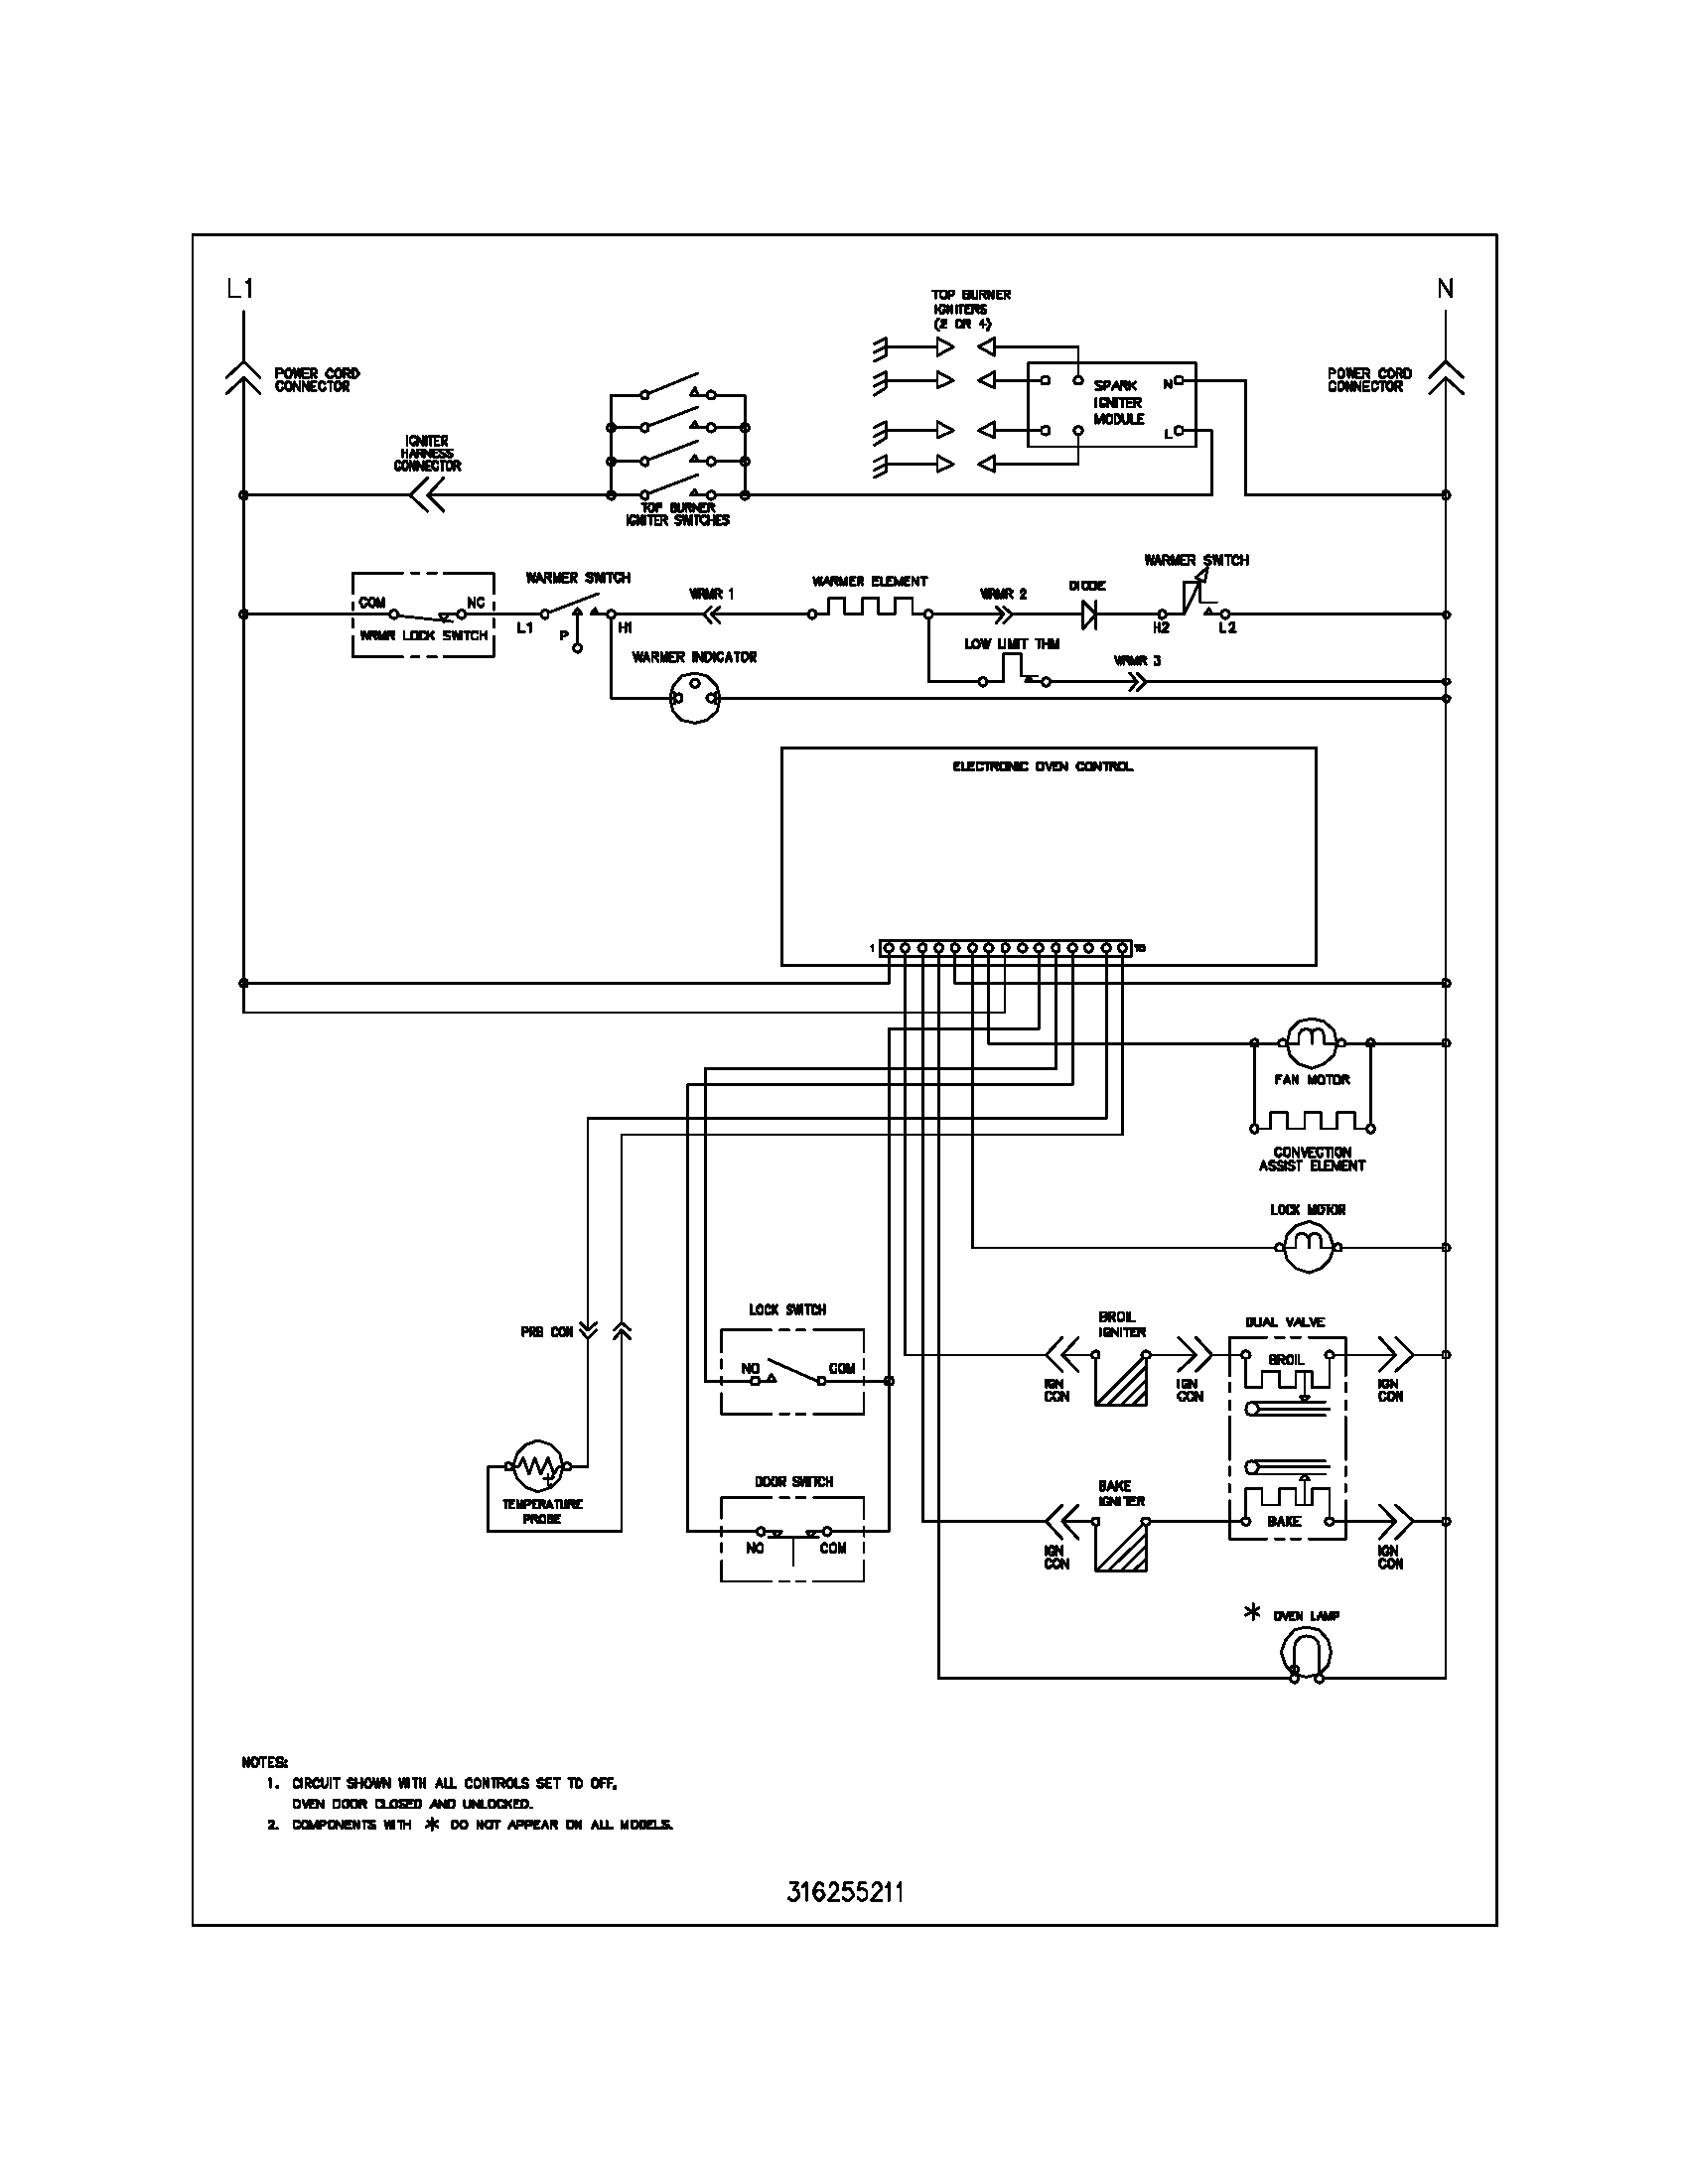 Eb15B Electric Furnace Wiring Diagrams - All Wiring Diagram - Goodman Electric Furnace Wiring Diagram